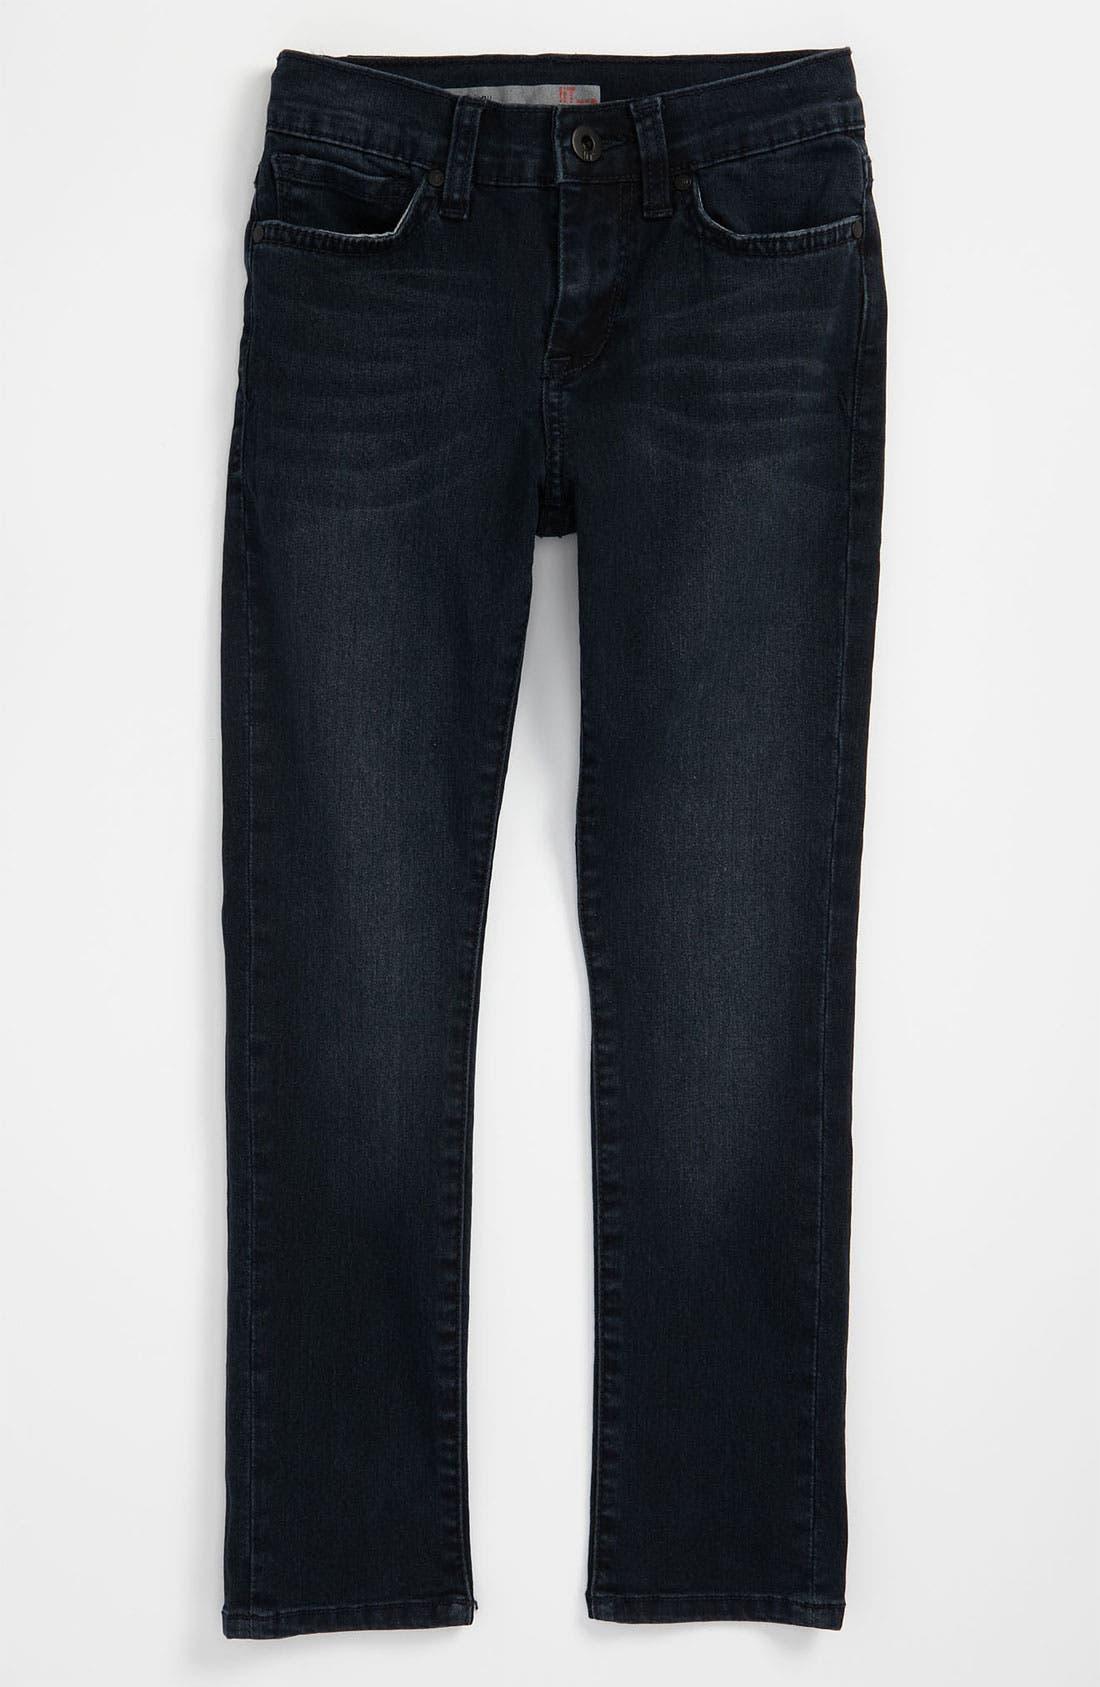 Alternate Image 2  - !iT JEANS 'Starlett' Skinny Jeans (Big Girls)